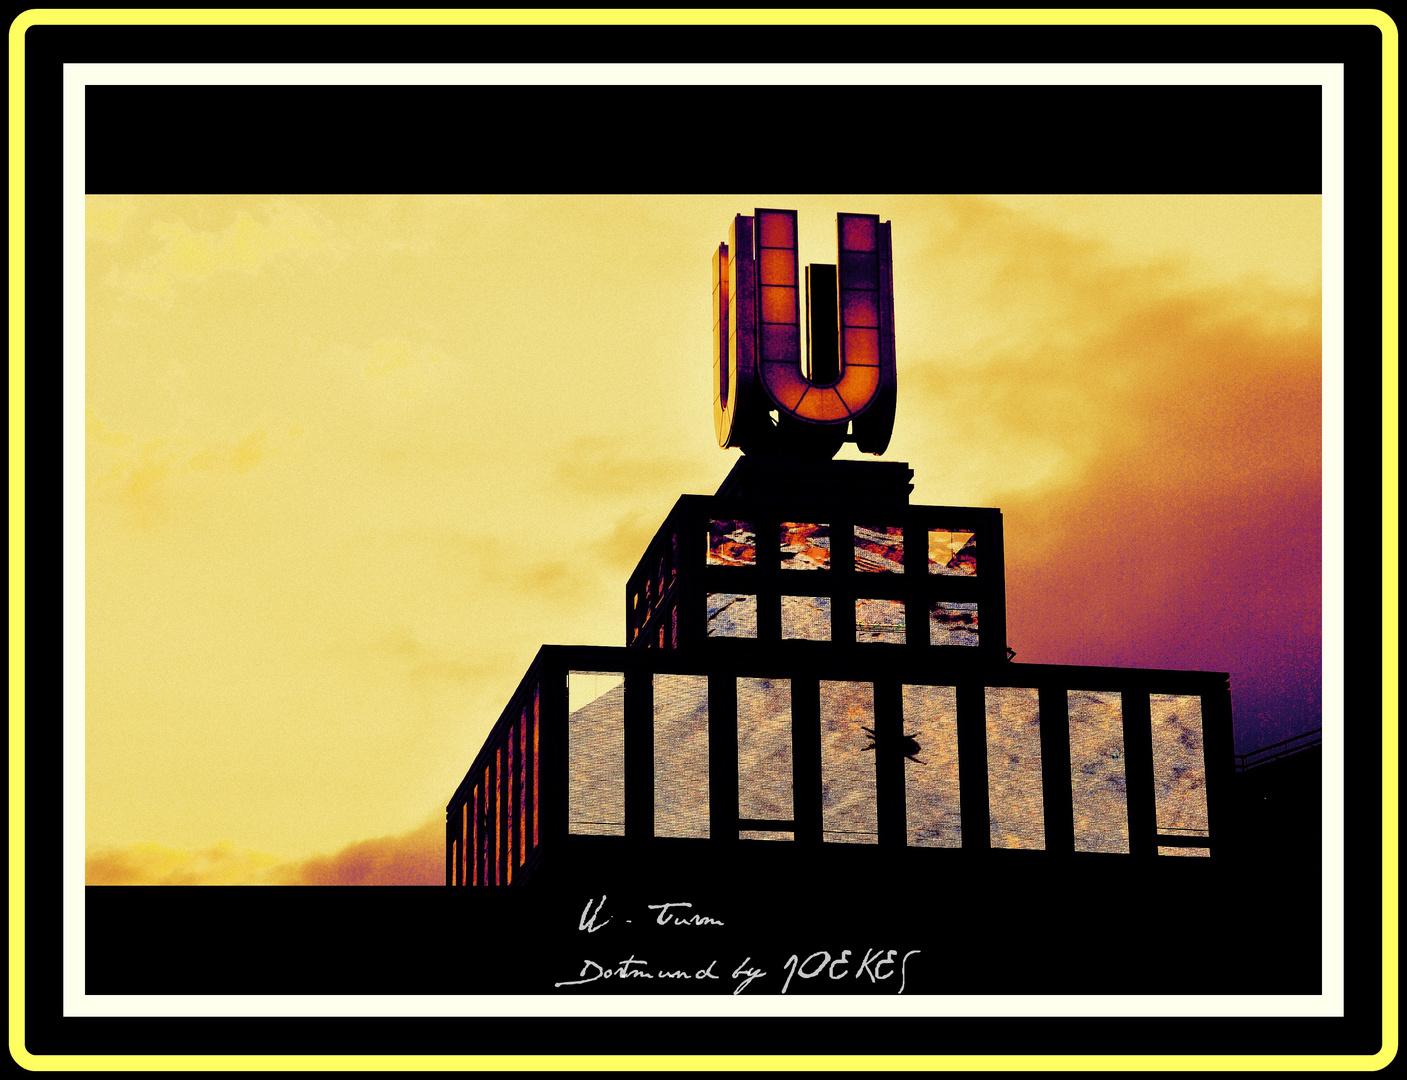 U - Turm Dortmund